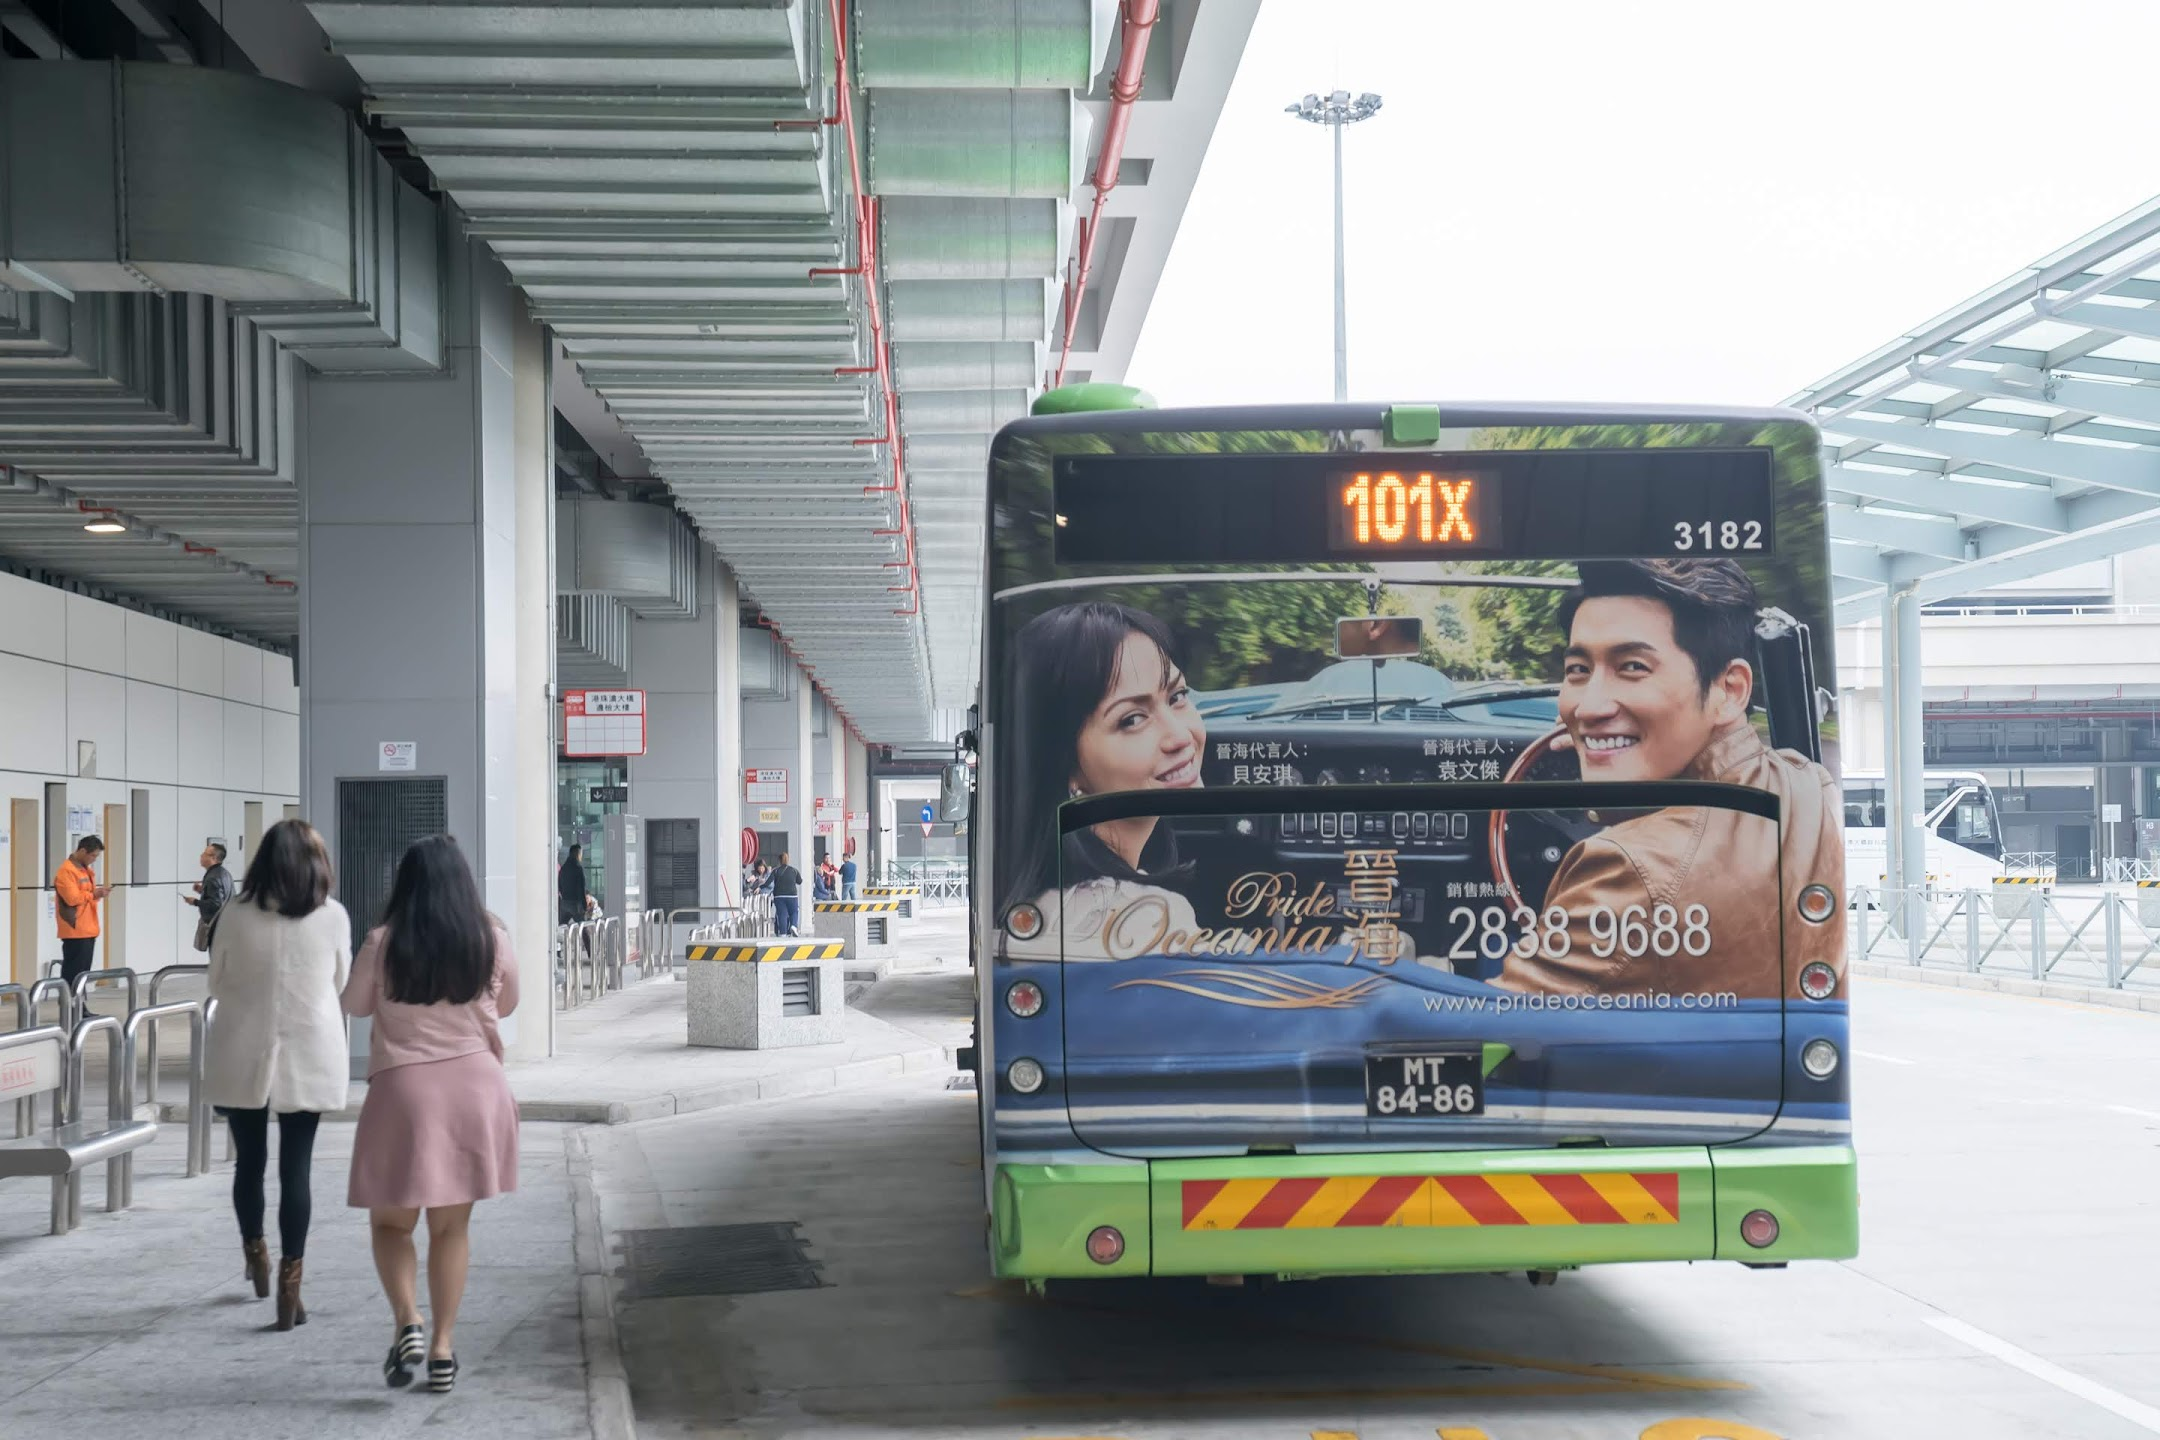 Macau 101X